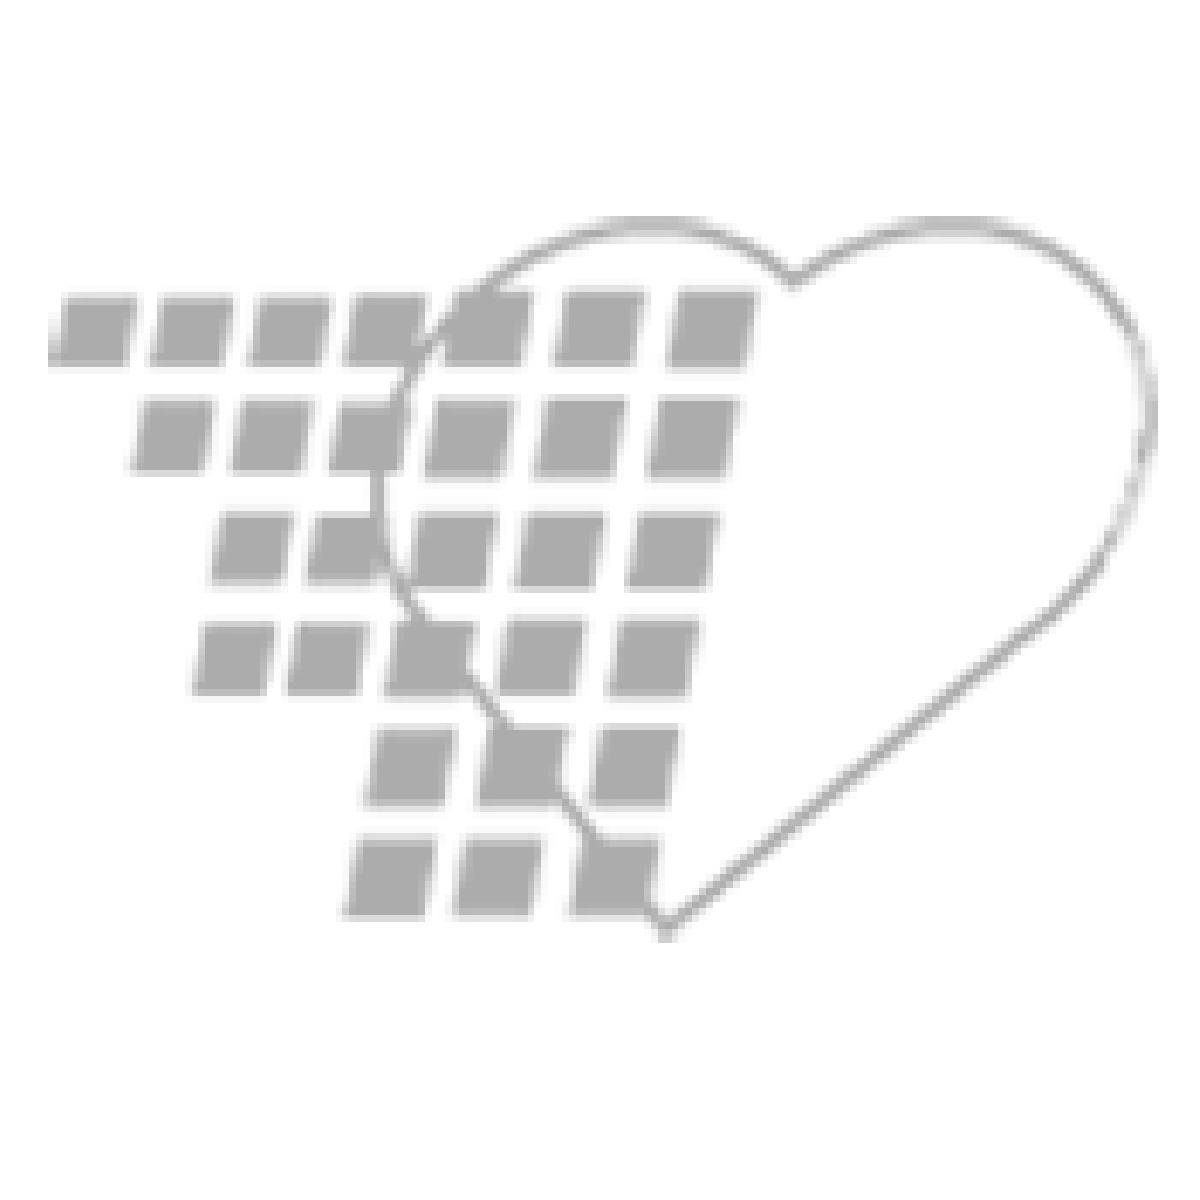 12-81-0110 Gaumard Mike® and Michelle® One Year Pediatric Care Simulator